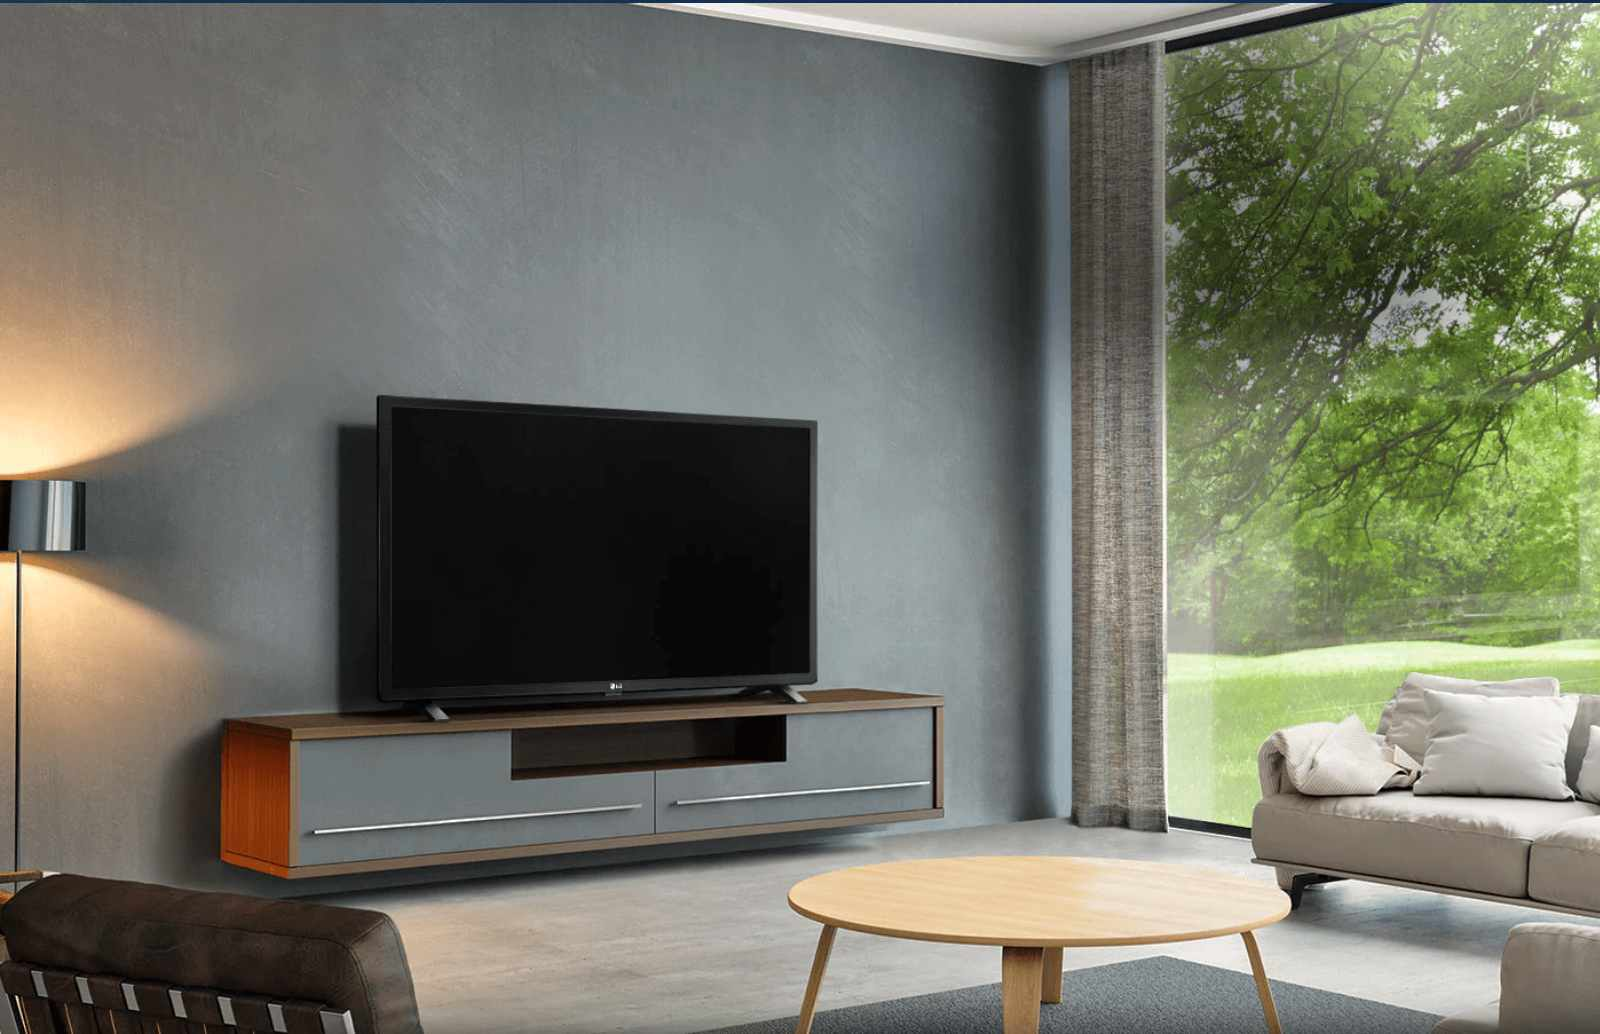 LG Smart LED TV design